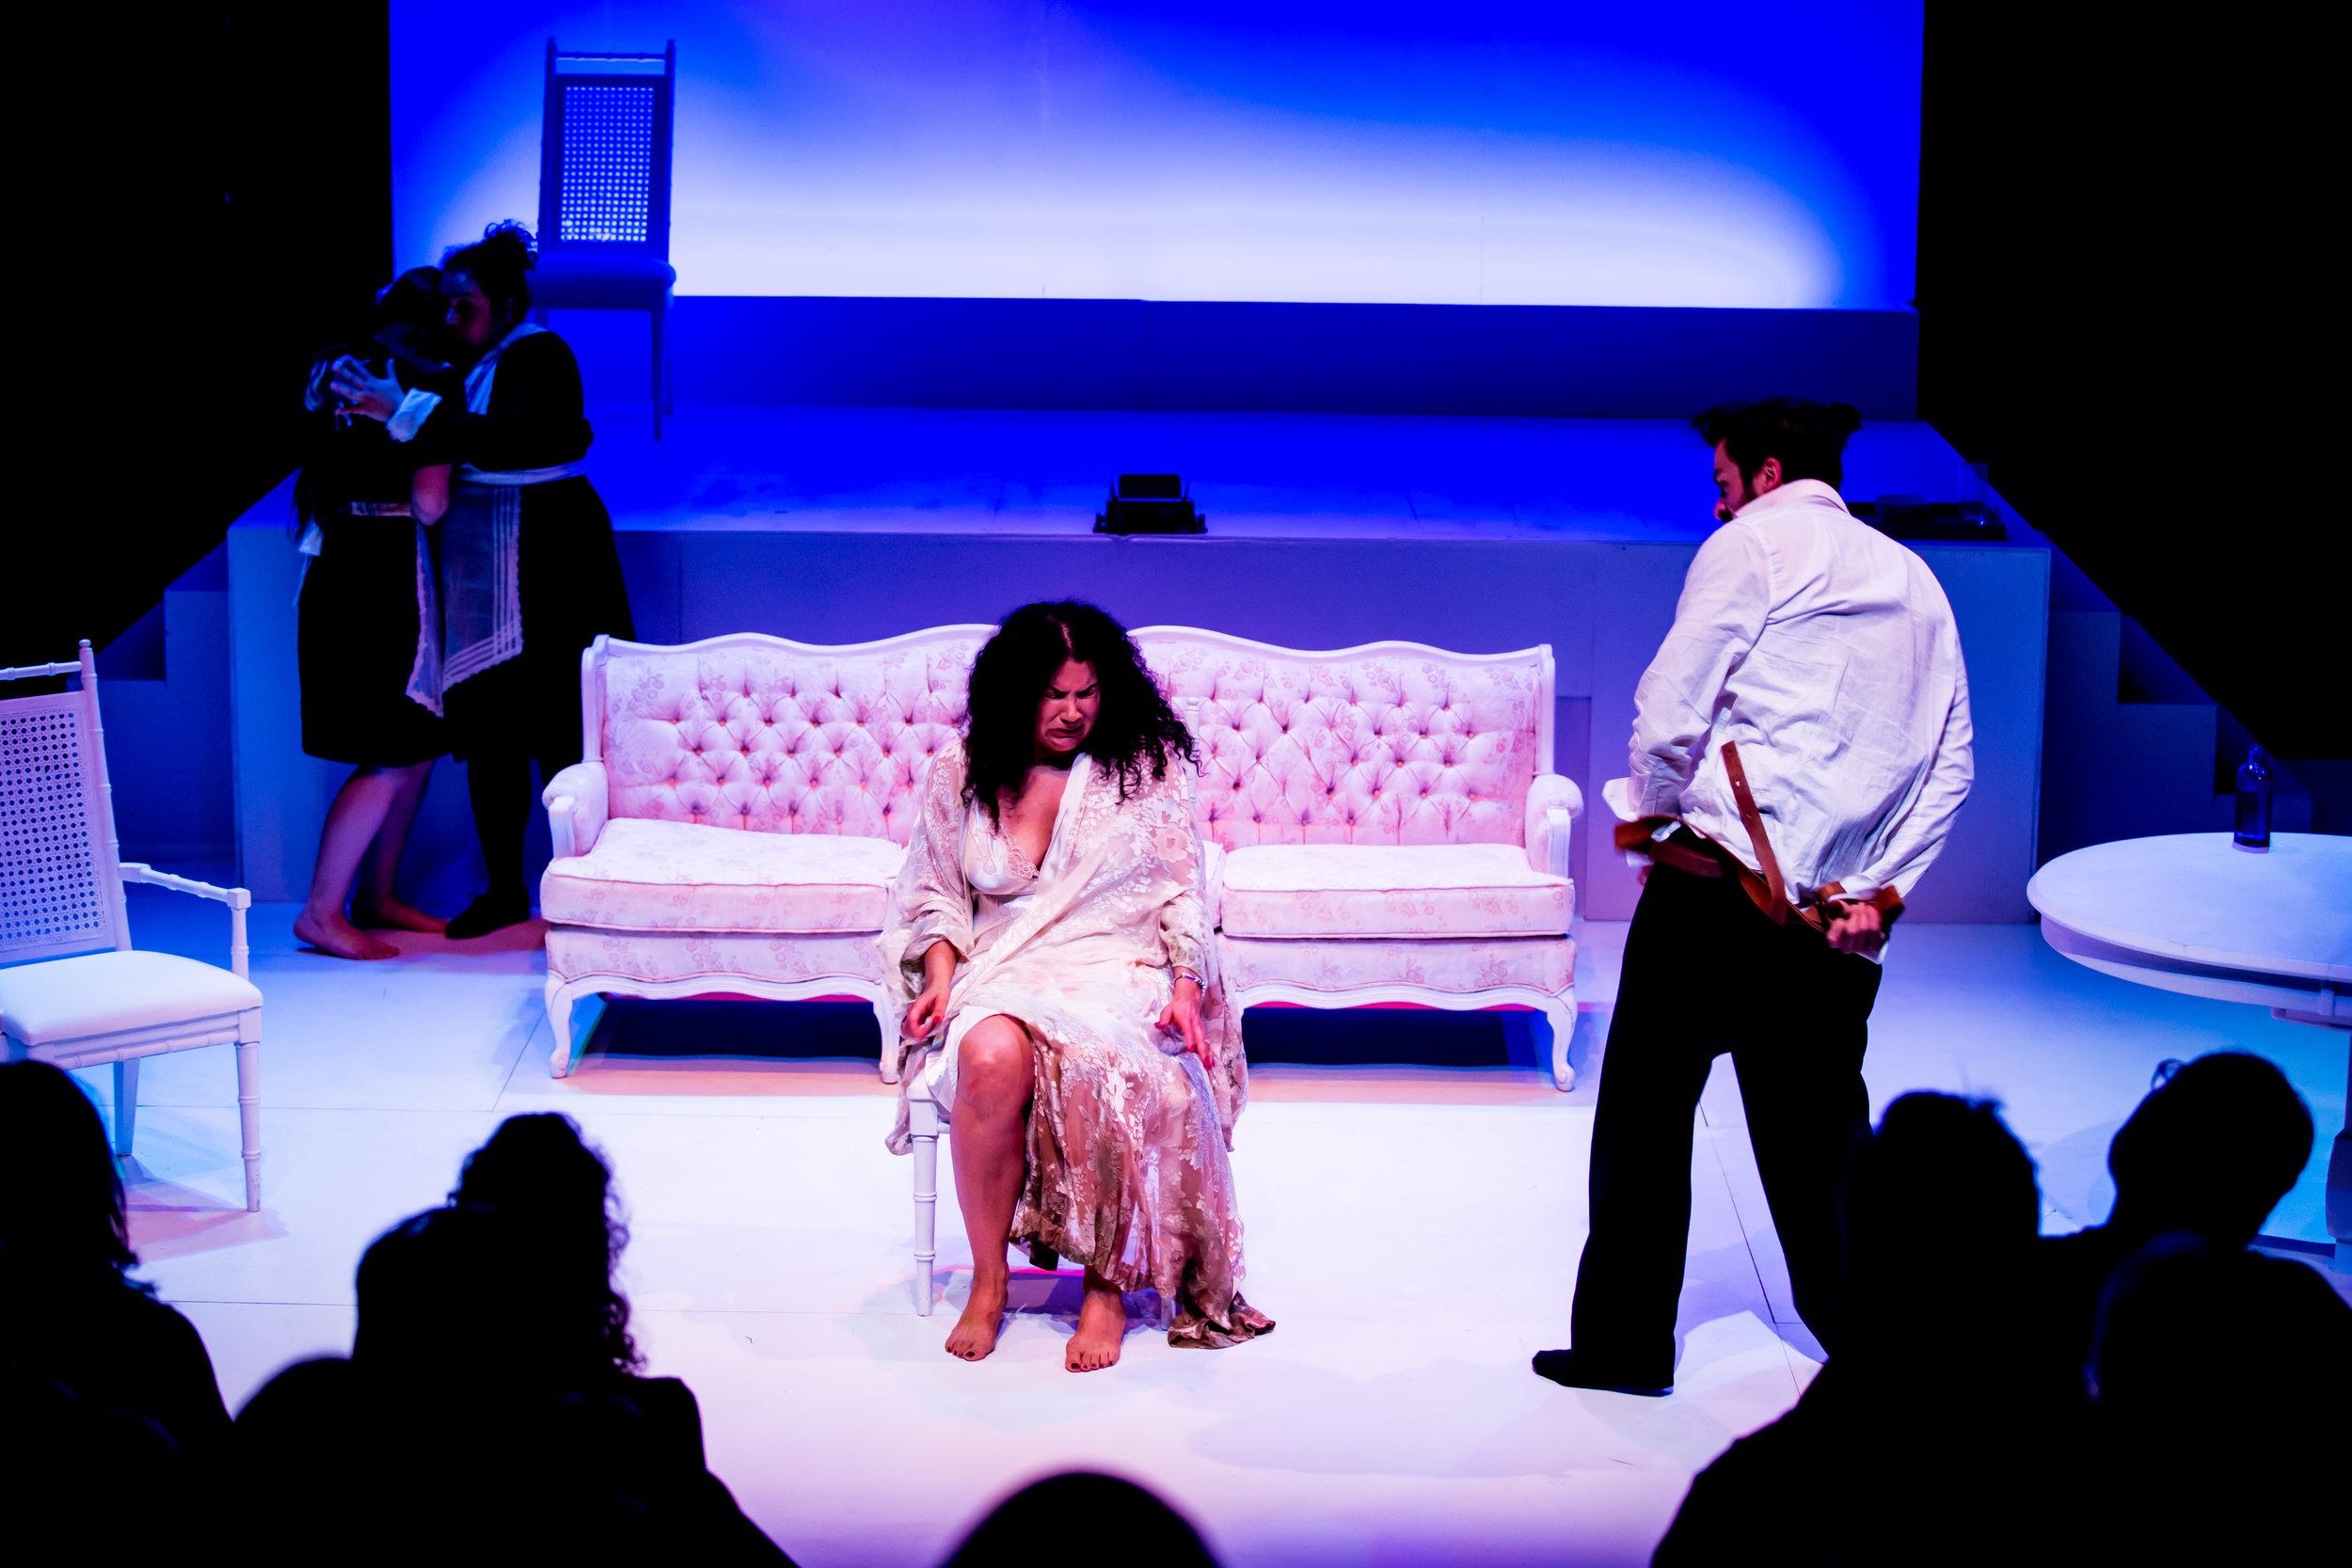 Hero-Theater-Final_17-06-11-0110.jpg